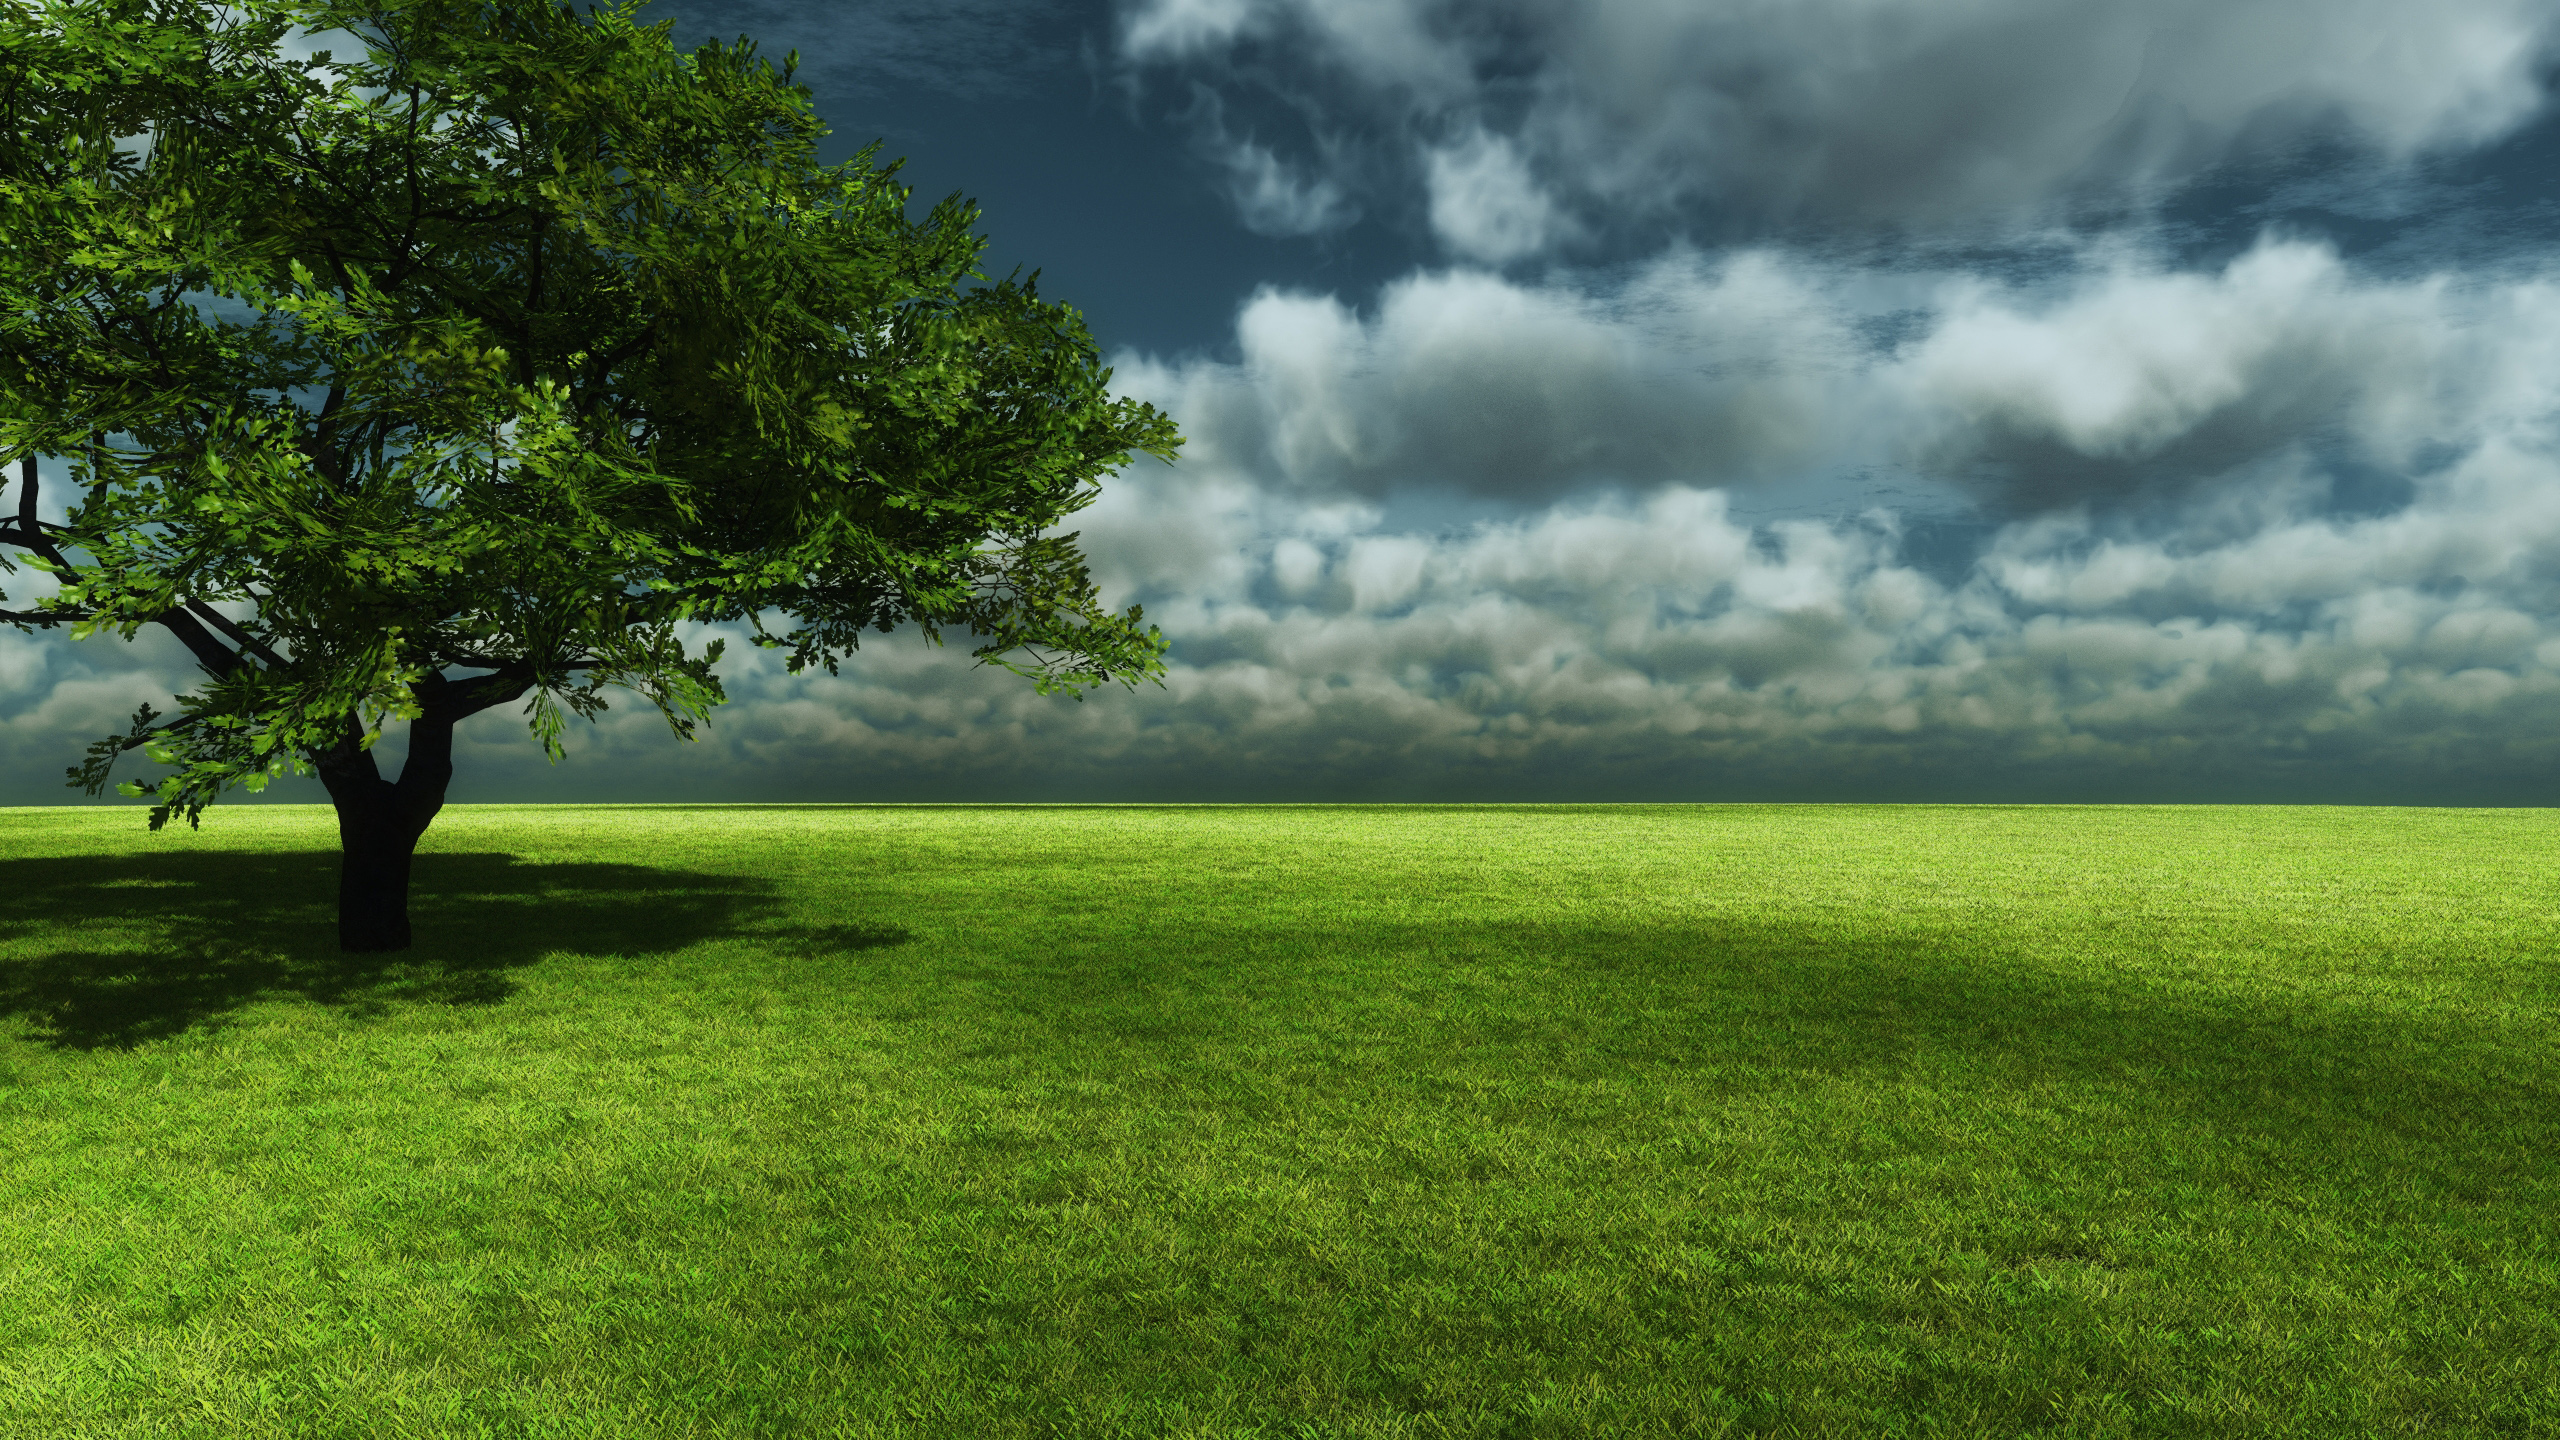 tree_of_life_wallpaper_2560x1440